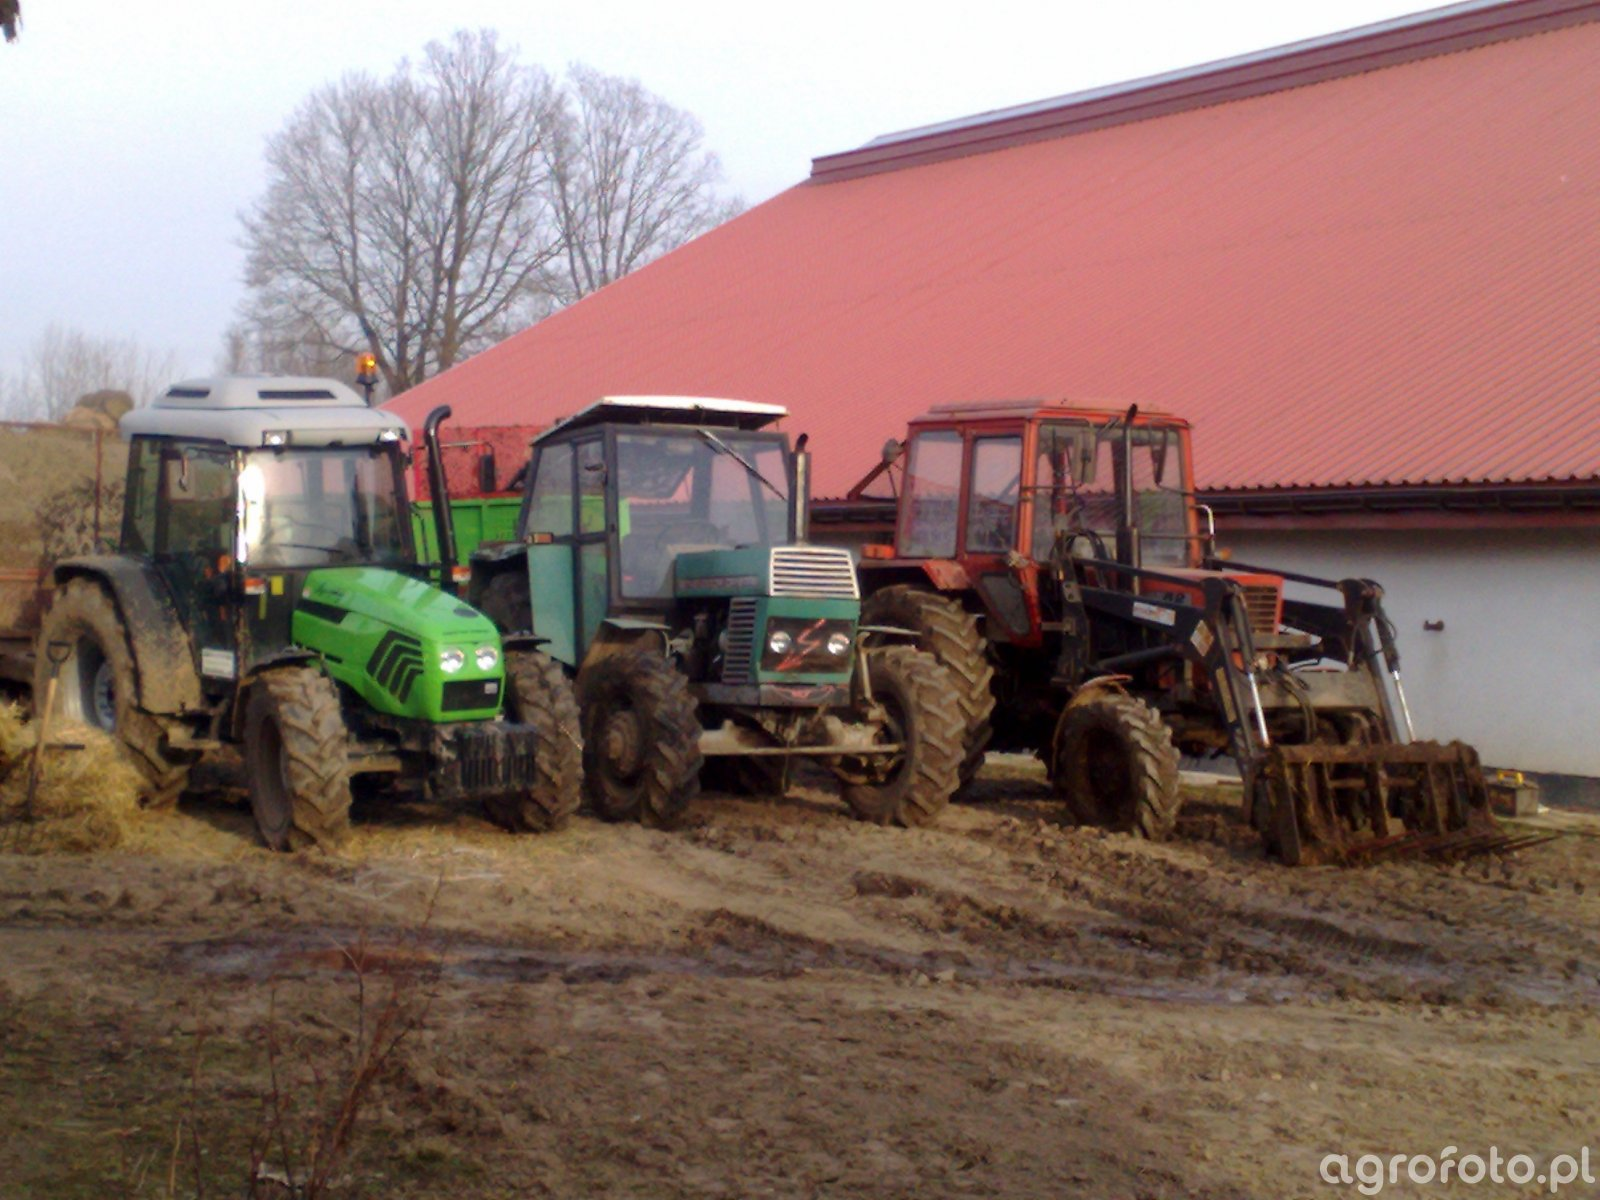 Deutz-Fahr Agroplus ,Zetor CRYSTAL 8045, MTZ 85